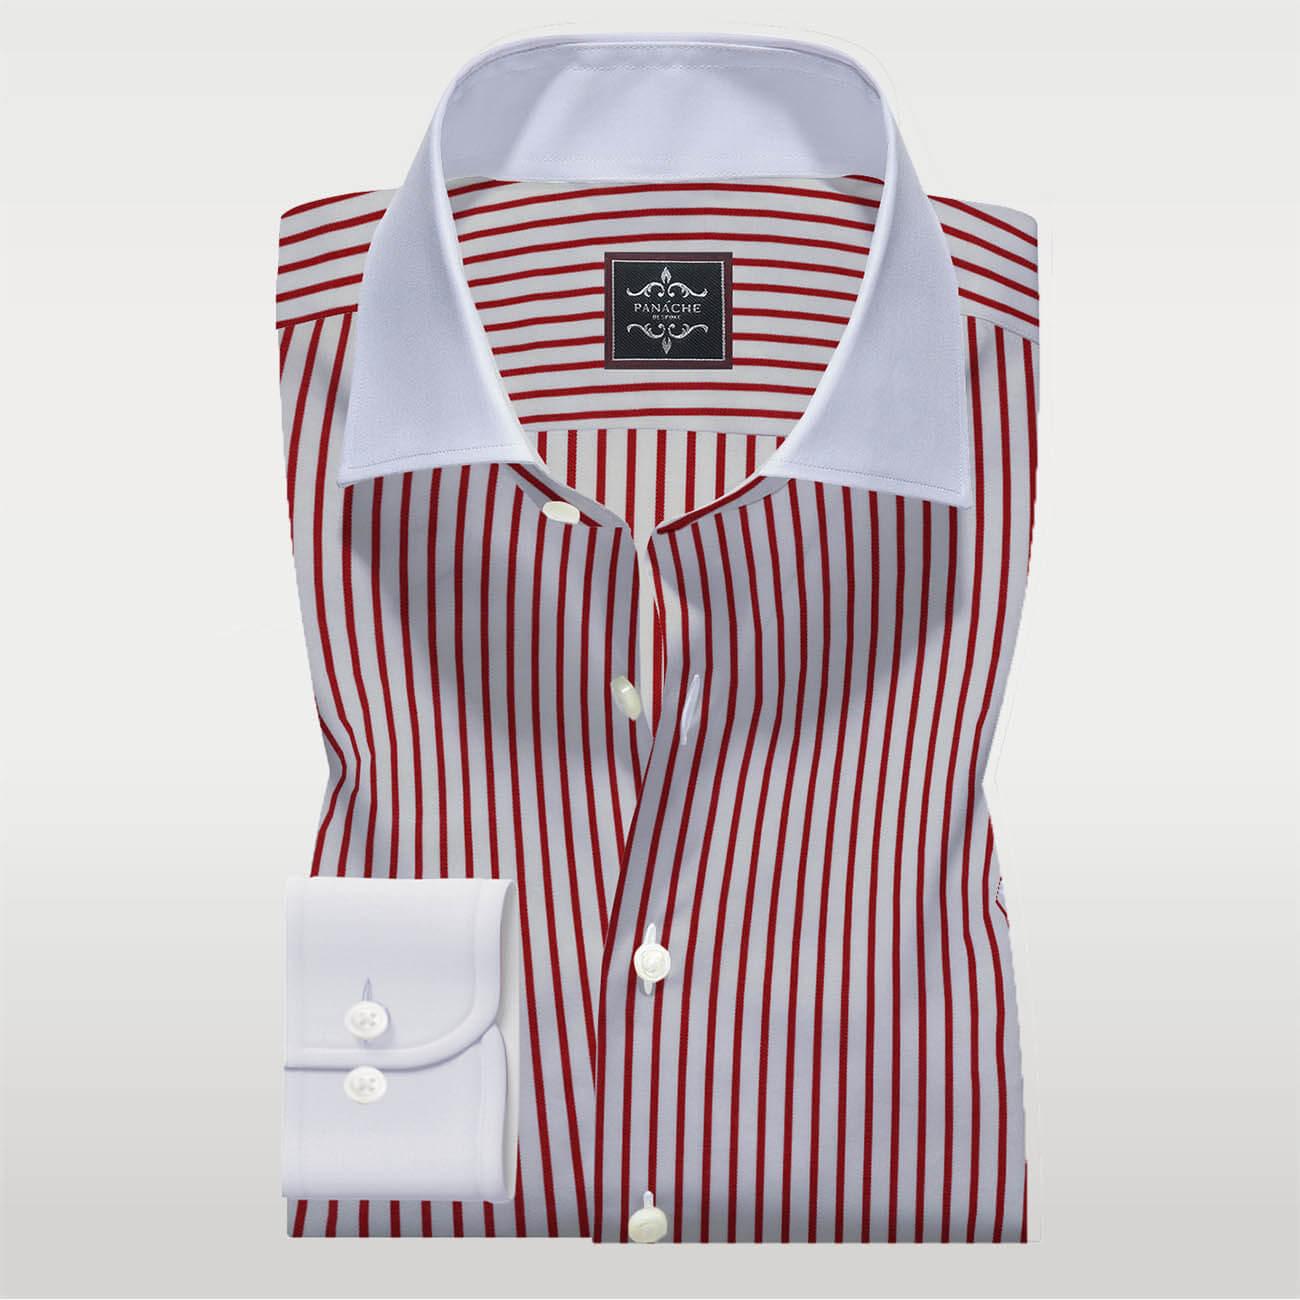 Best Quality Mens Dress Shirts 1